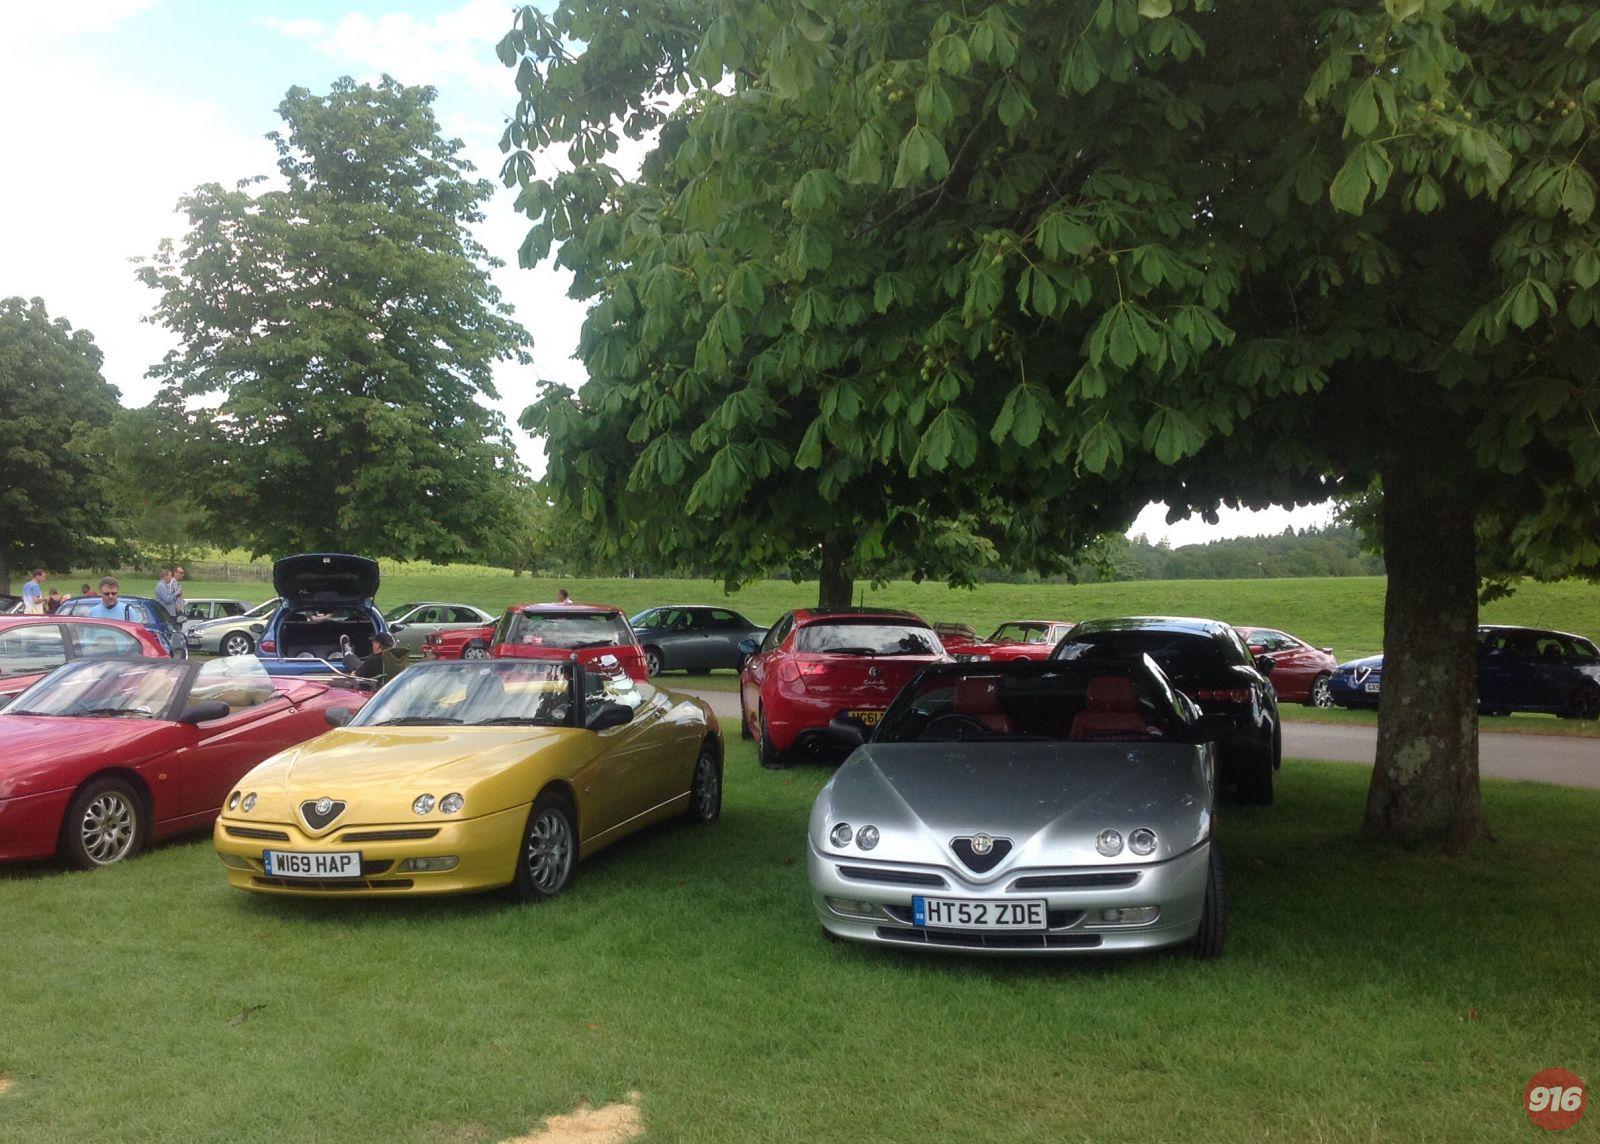 Simply Alfa Romeo Day 29th June 2014, Beaulieu National Motor Museum.